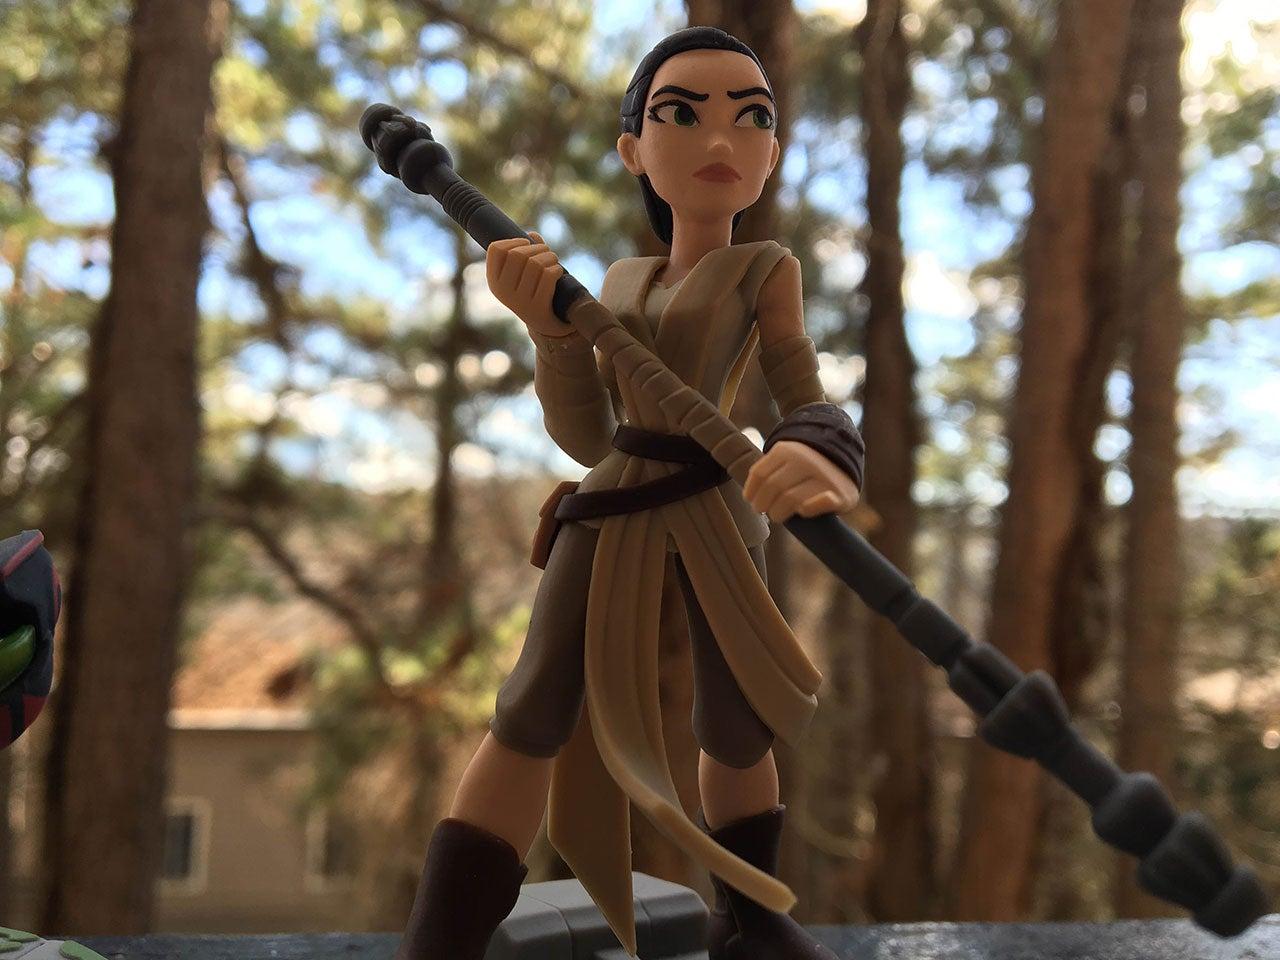 Star Wars The Force Awakens Deserves A Better Disney Infinity Play Set